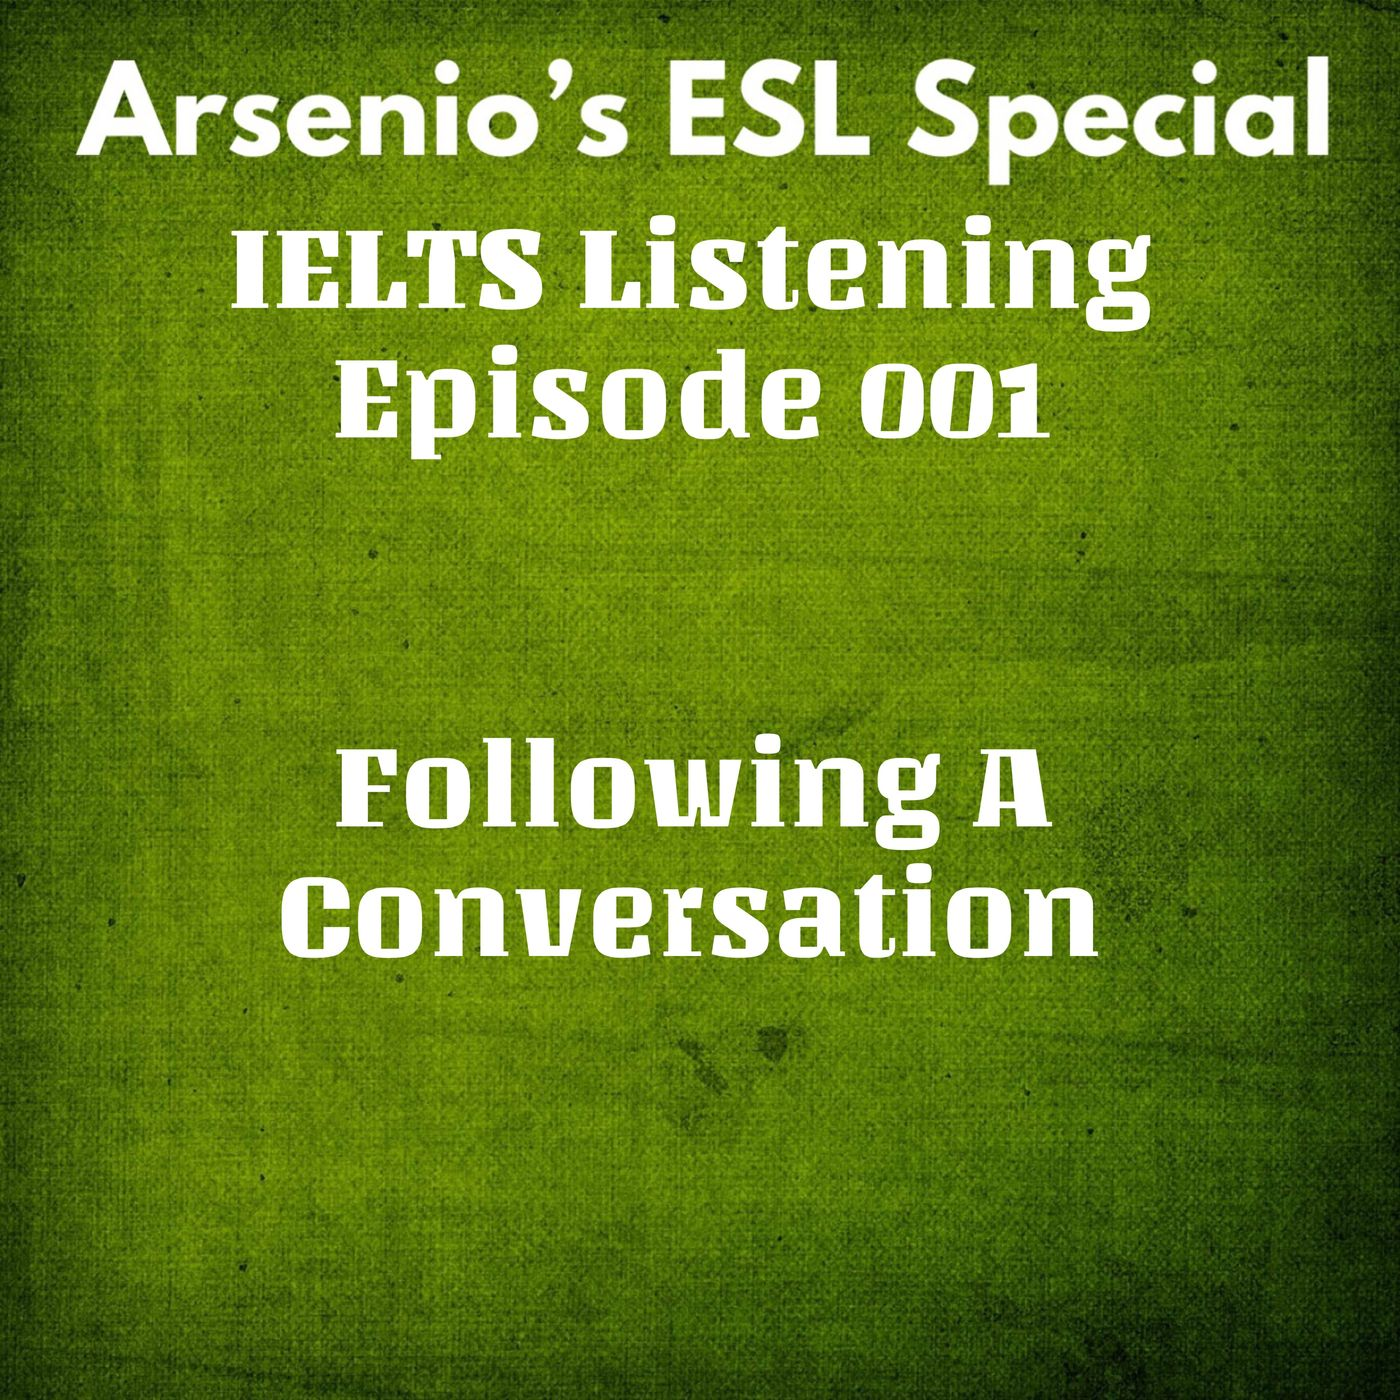 Arsenio's ESL Podcast: IELTS Listening - Episode 001 - Following a Conversation